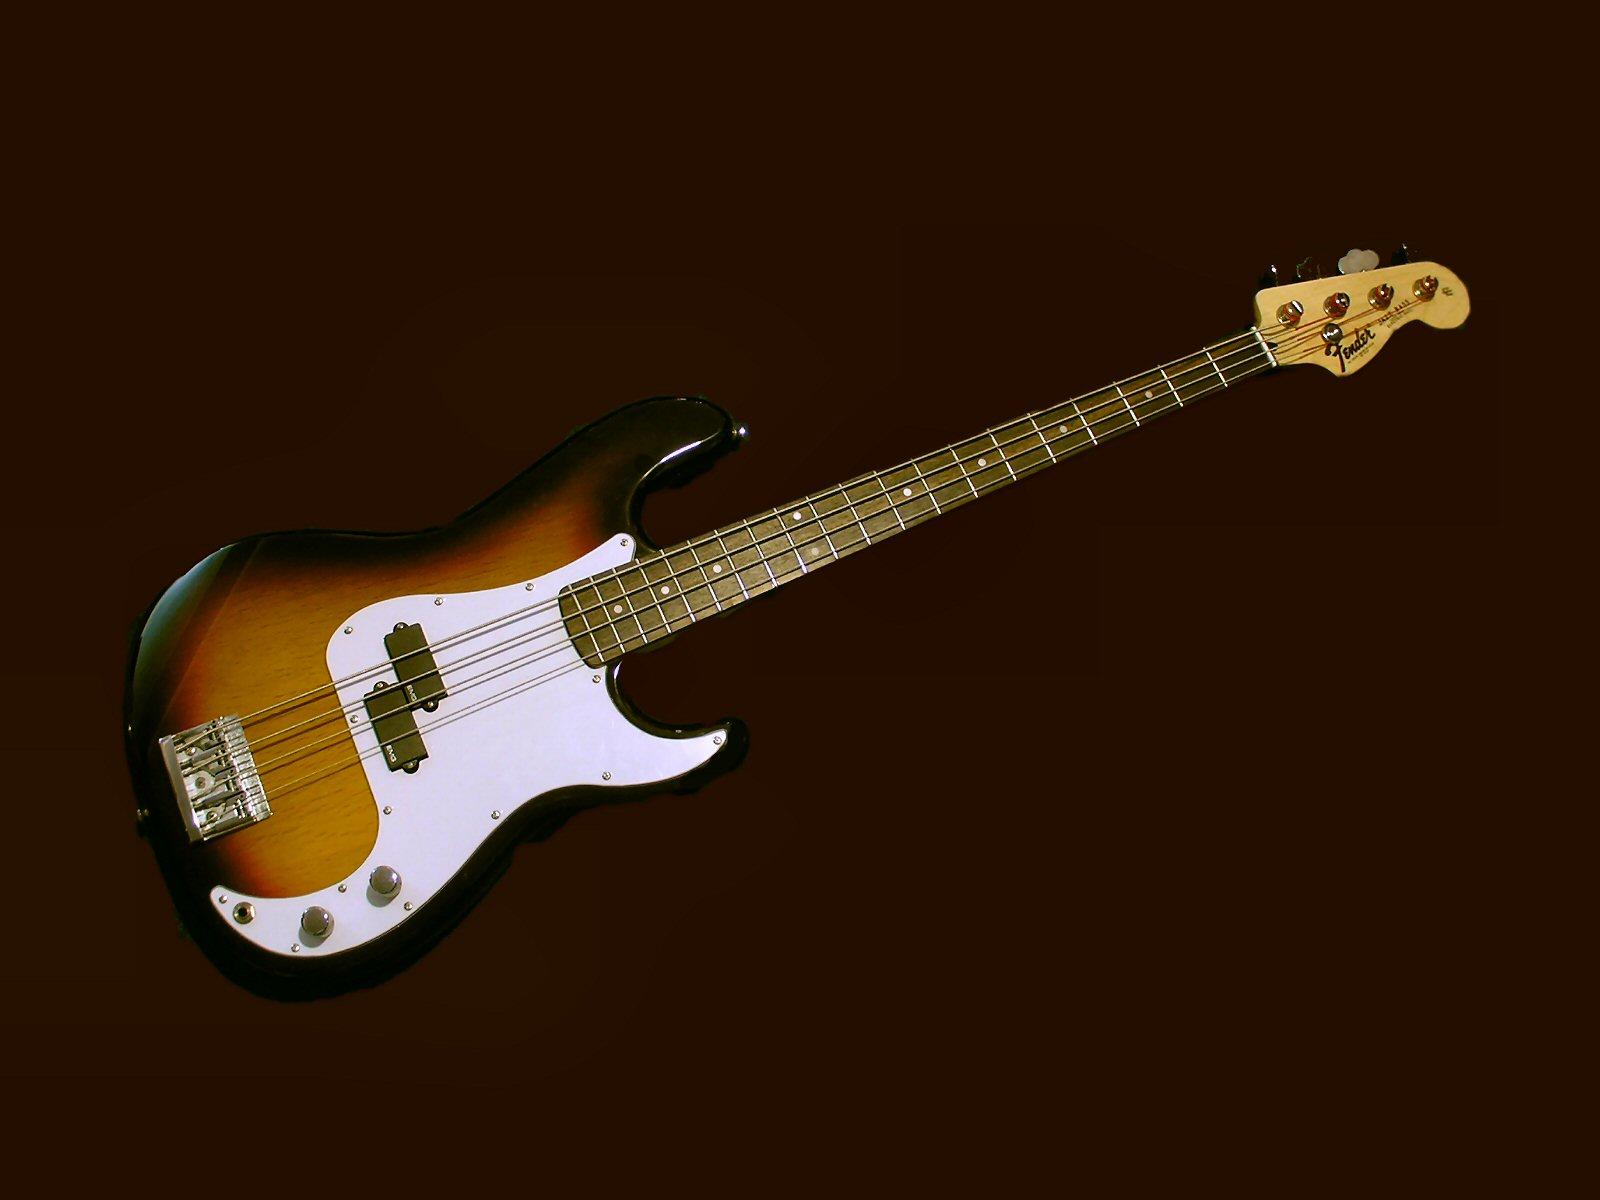 Bass Guitar Wallpapers High Quality